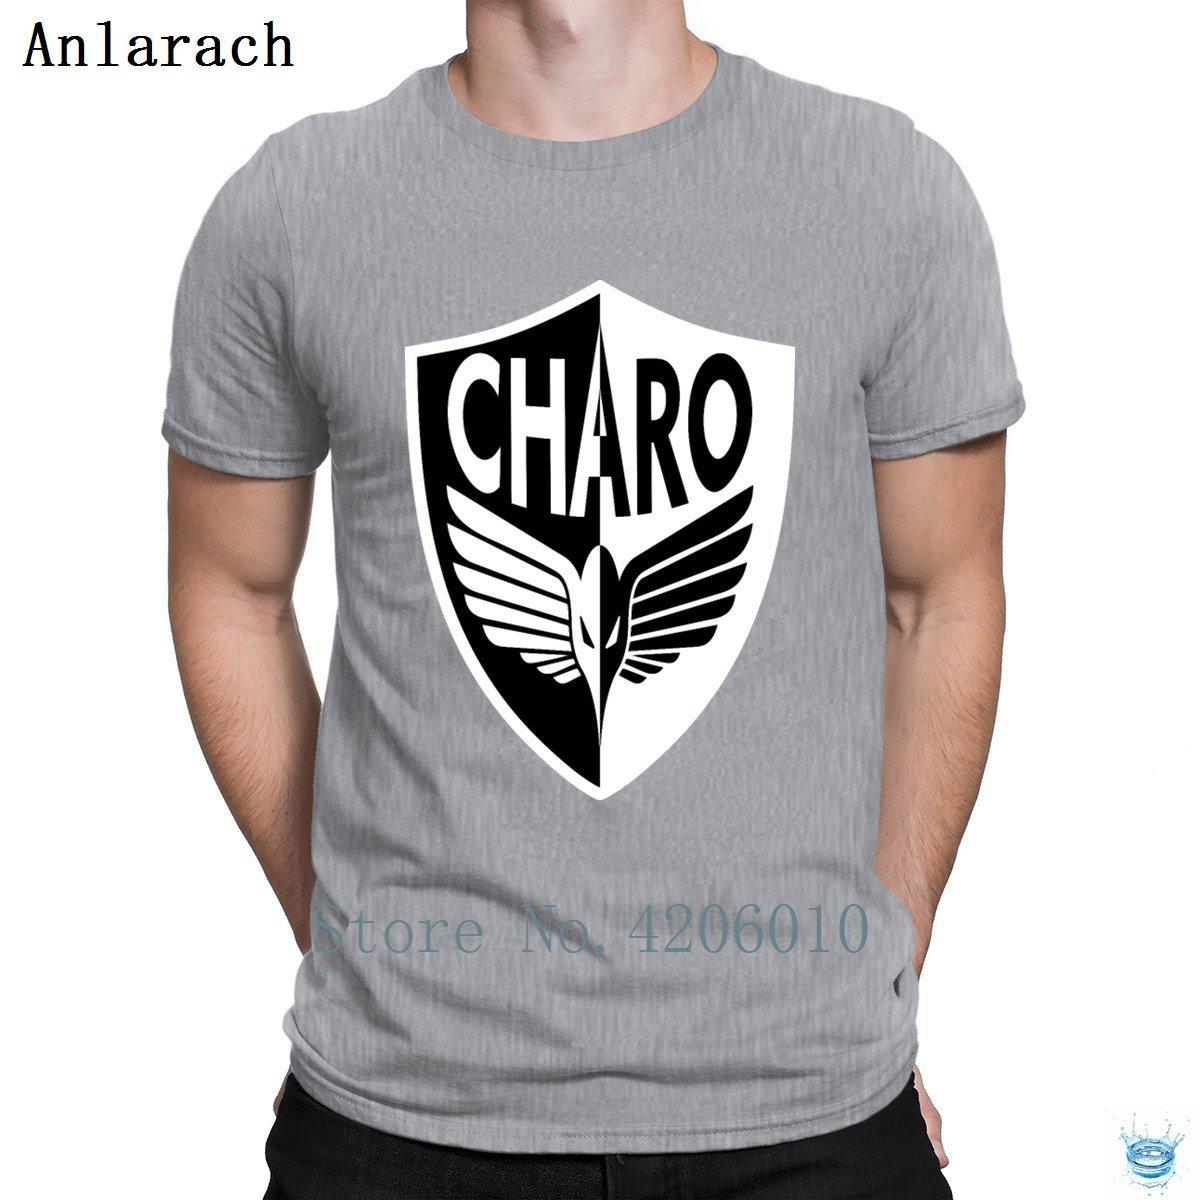 Charo Rap T-Shirt Envío gratis Diseñando Summer Style Unique Tshirt For Men Fashion Calidad superior O Neck Anlarach Family